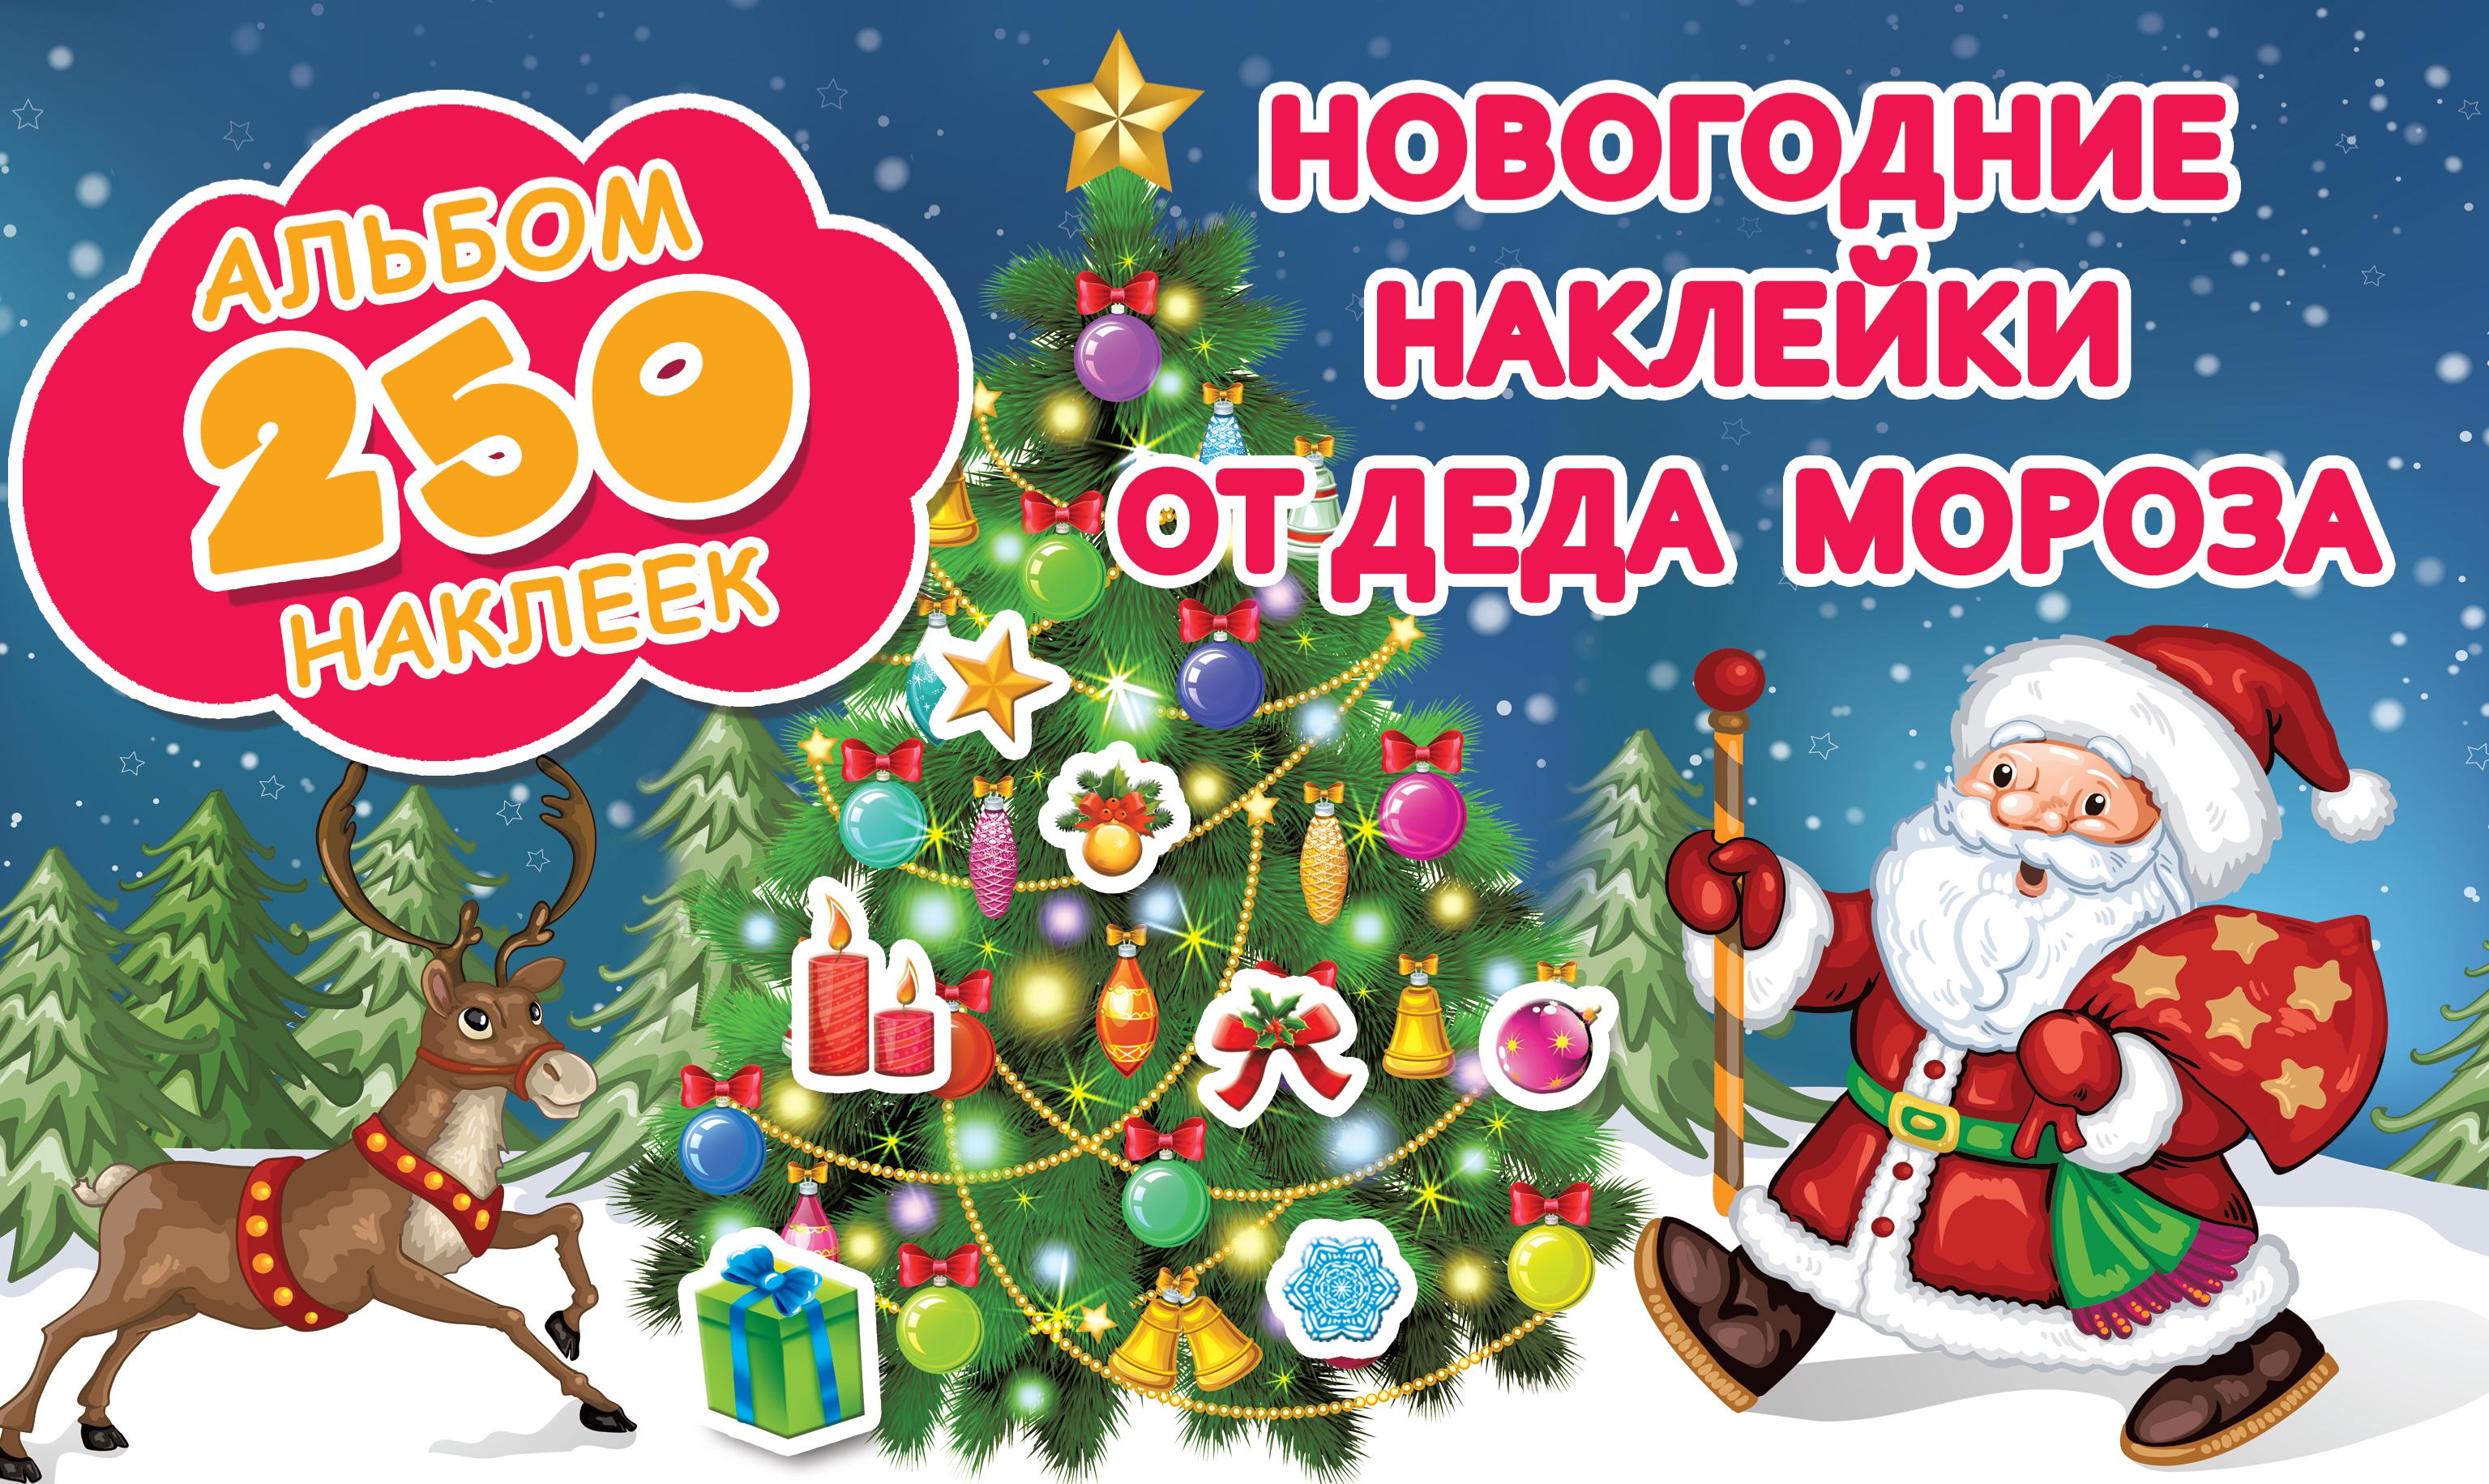 Горбунова И.В. Новогодние наклейки от Деда Мороза